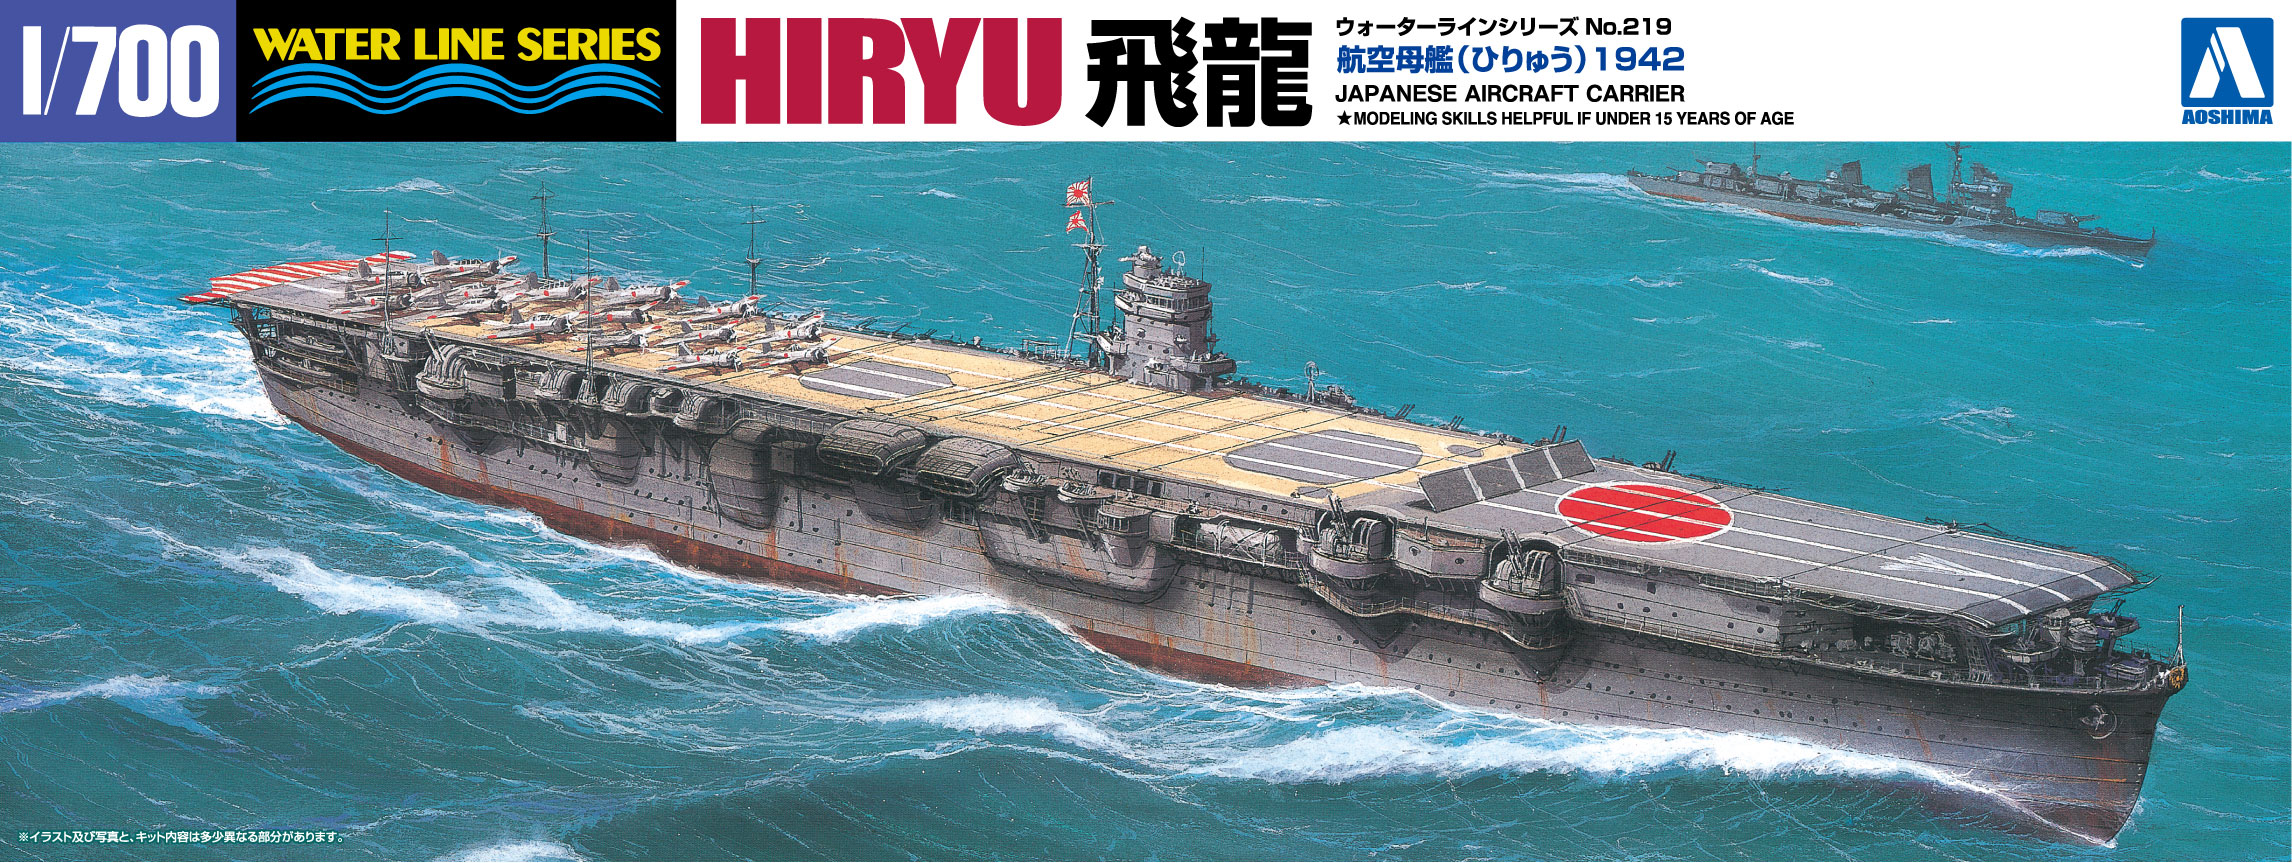 Aoshima 1/700 I.J.N. AIRCRAFT CARRIER HIRYU (1942)